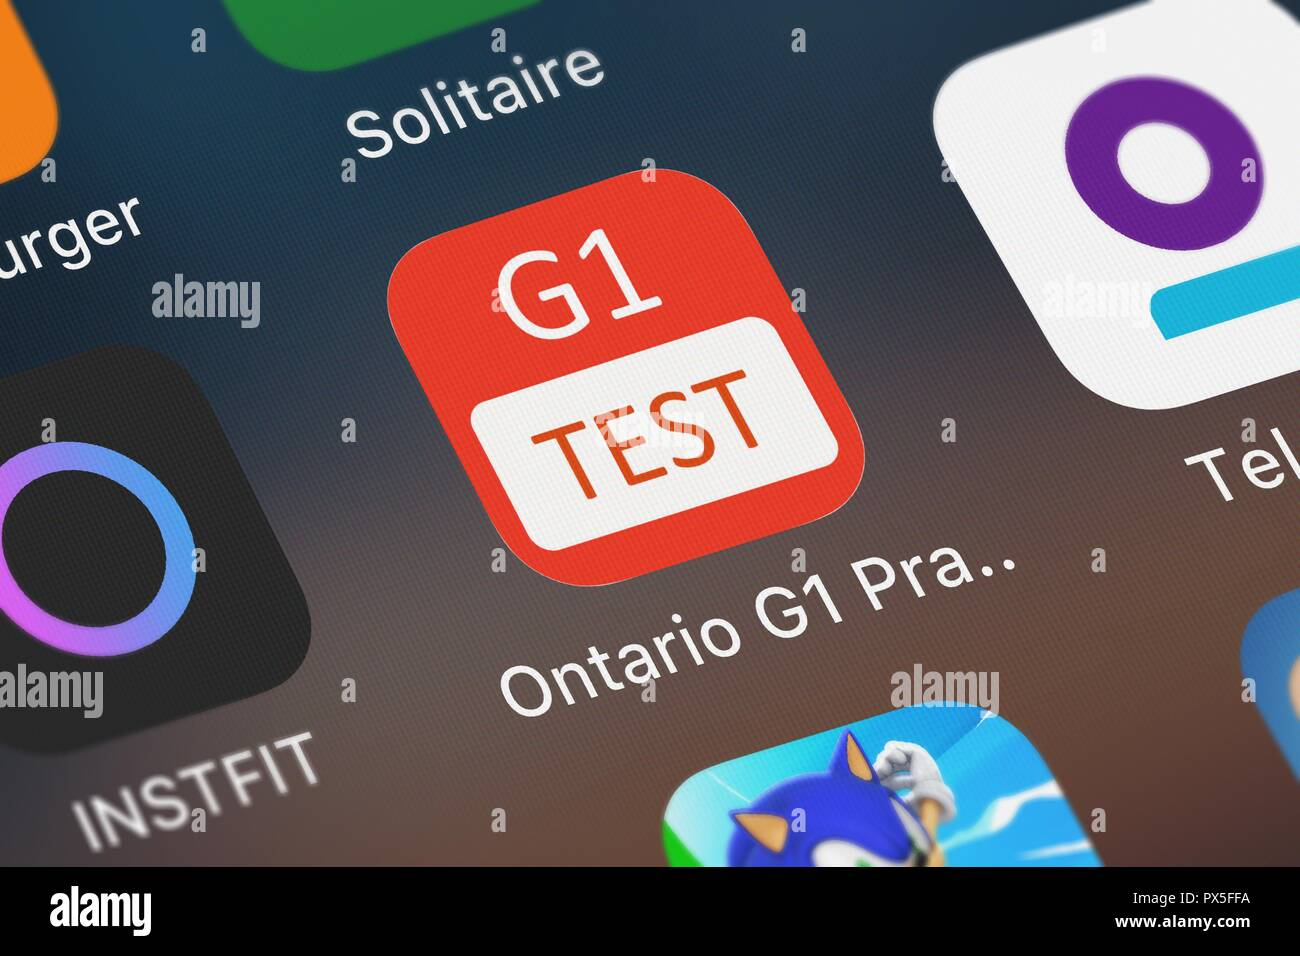 London, United Kingdom - October 19, 2018: Close-up shot of Nhu Quynh Nguyen's popular app Ontario G1 Practice Test. - Stock Image